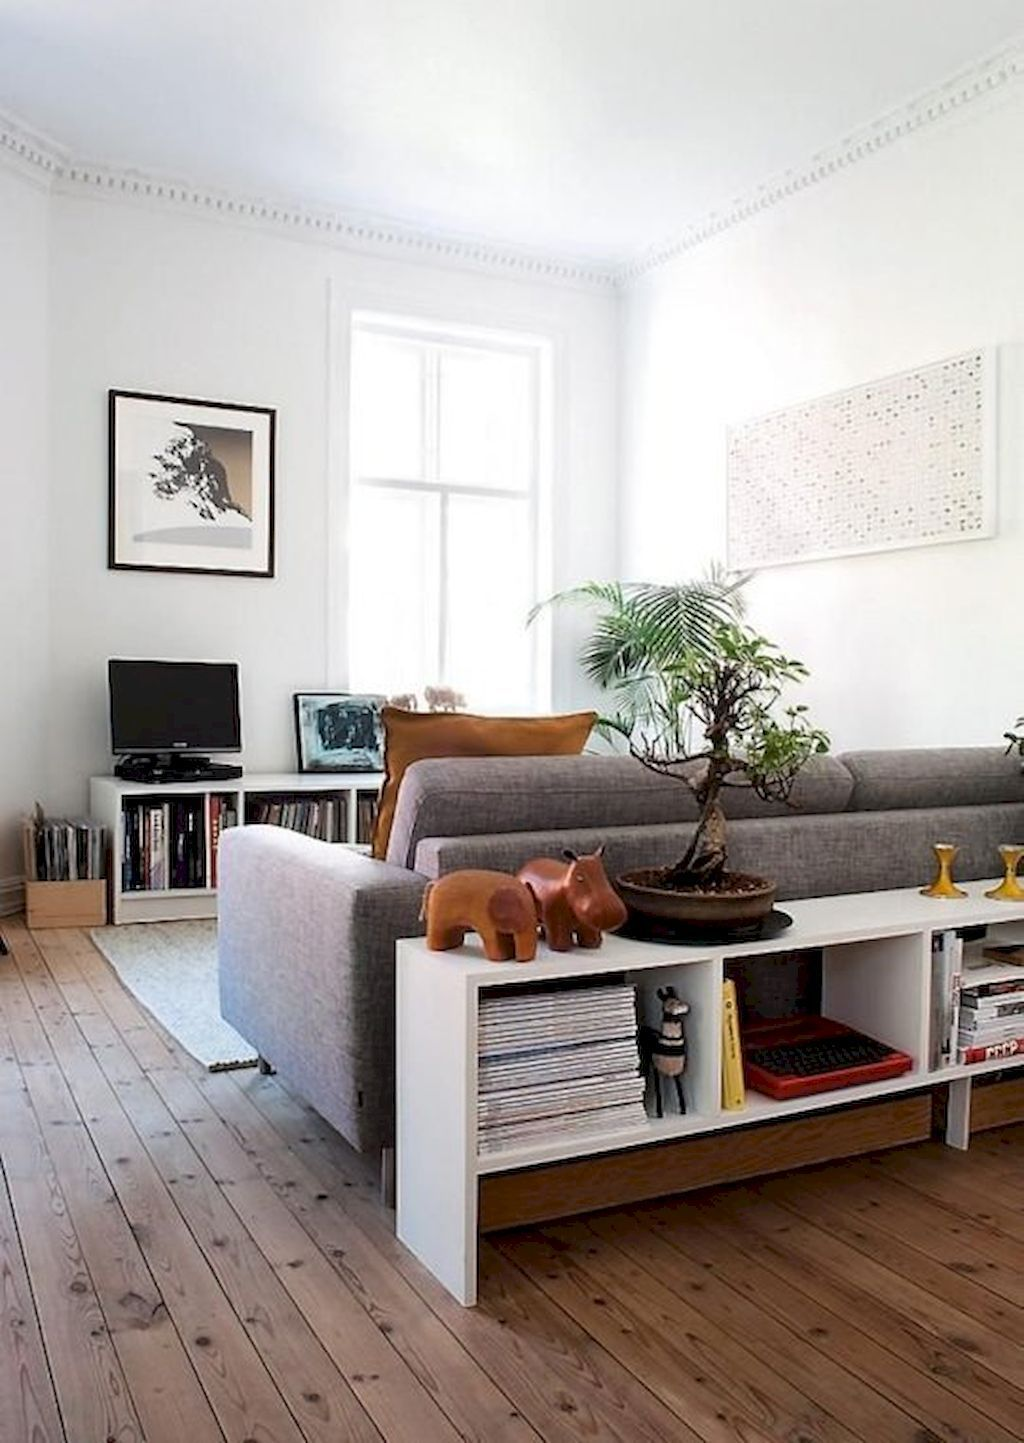 Interior home decorating ideas living room  home decor ideas a sofa for all occasions  apartments